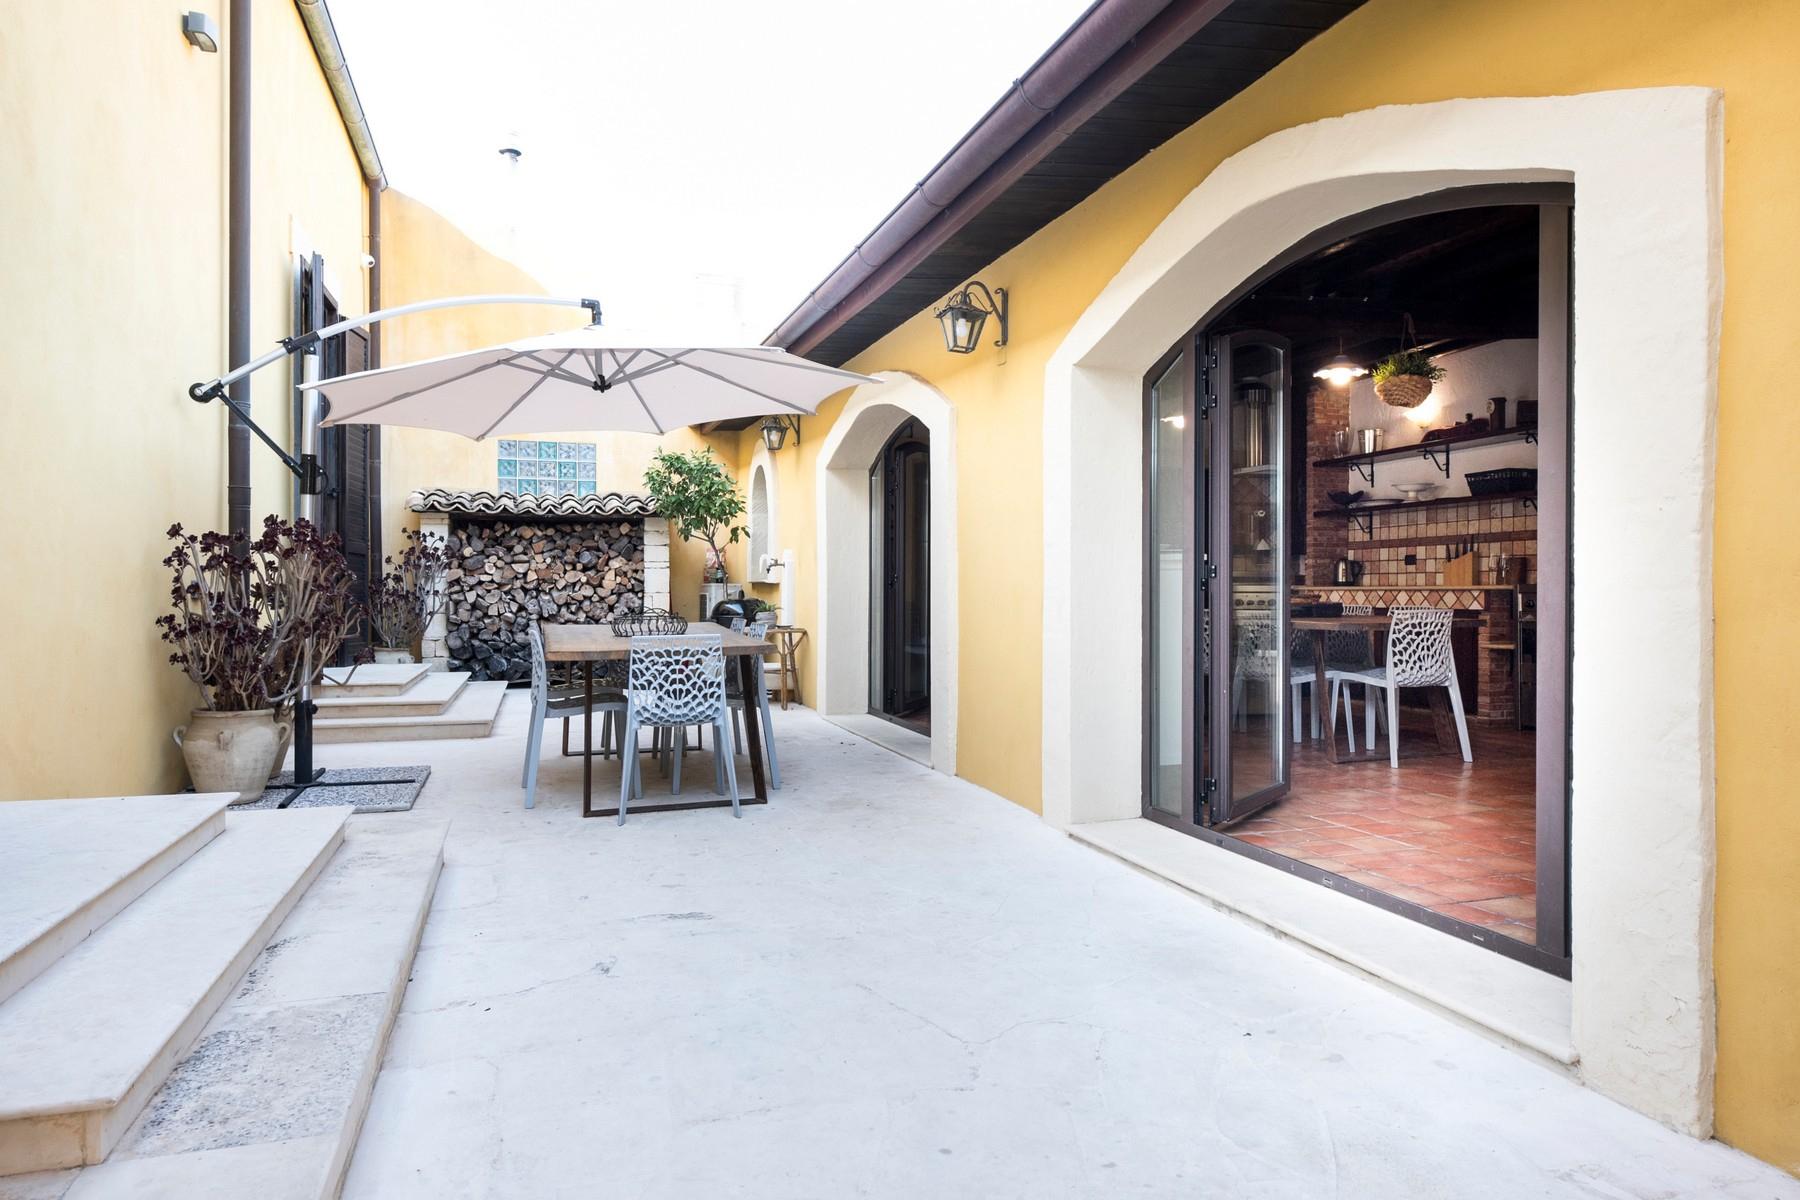 Casa indipendente in Vendita a Noto: 5 locali, 300 mq - Foto 7